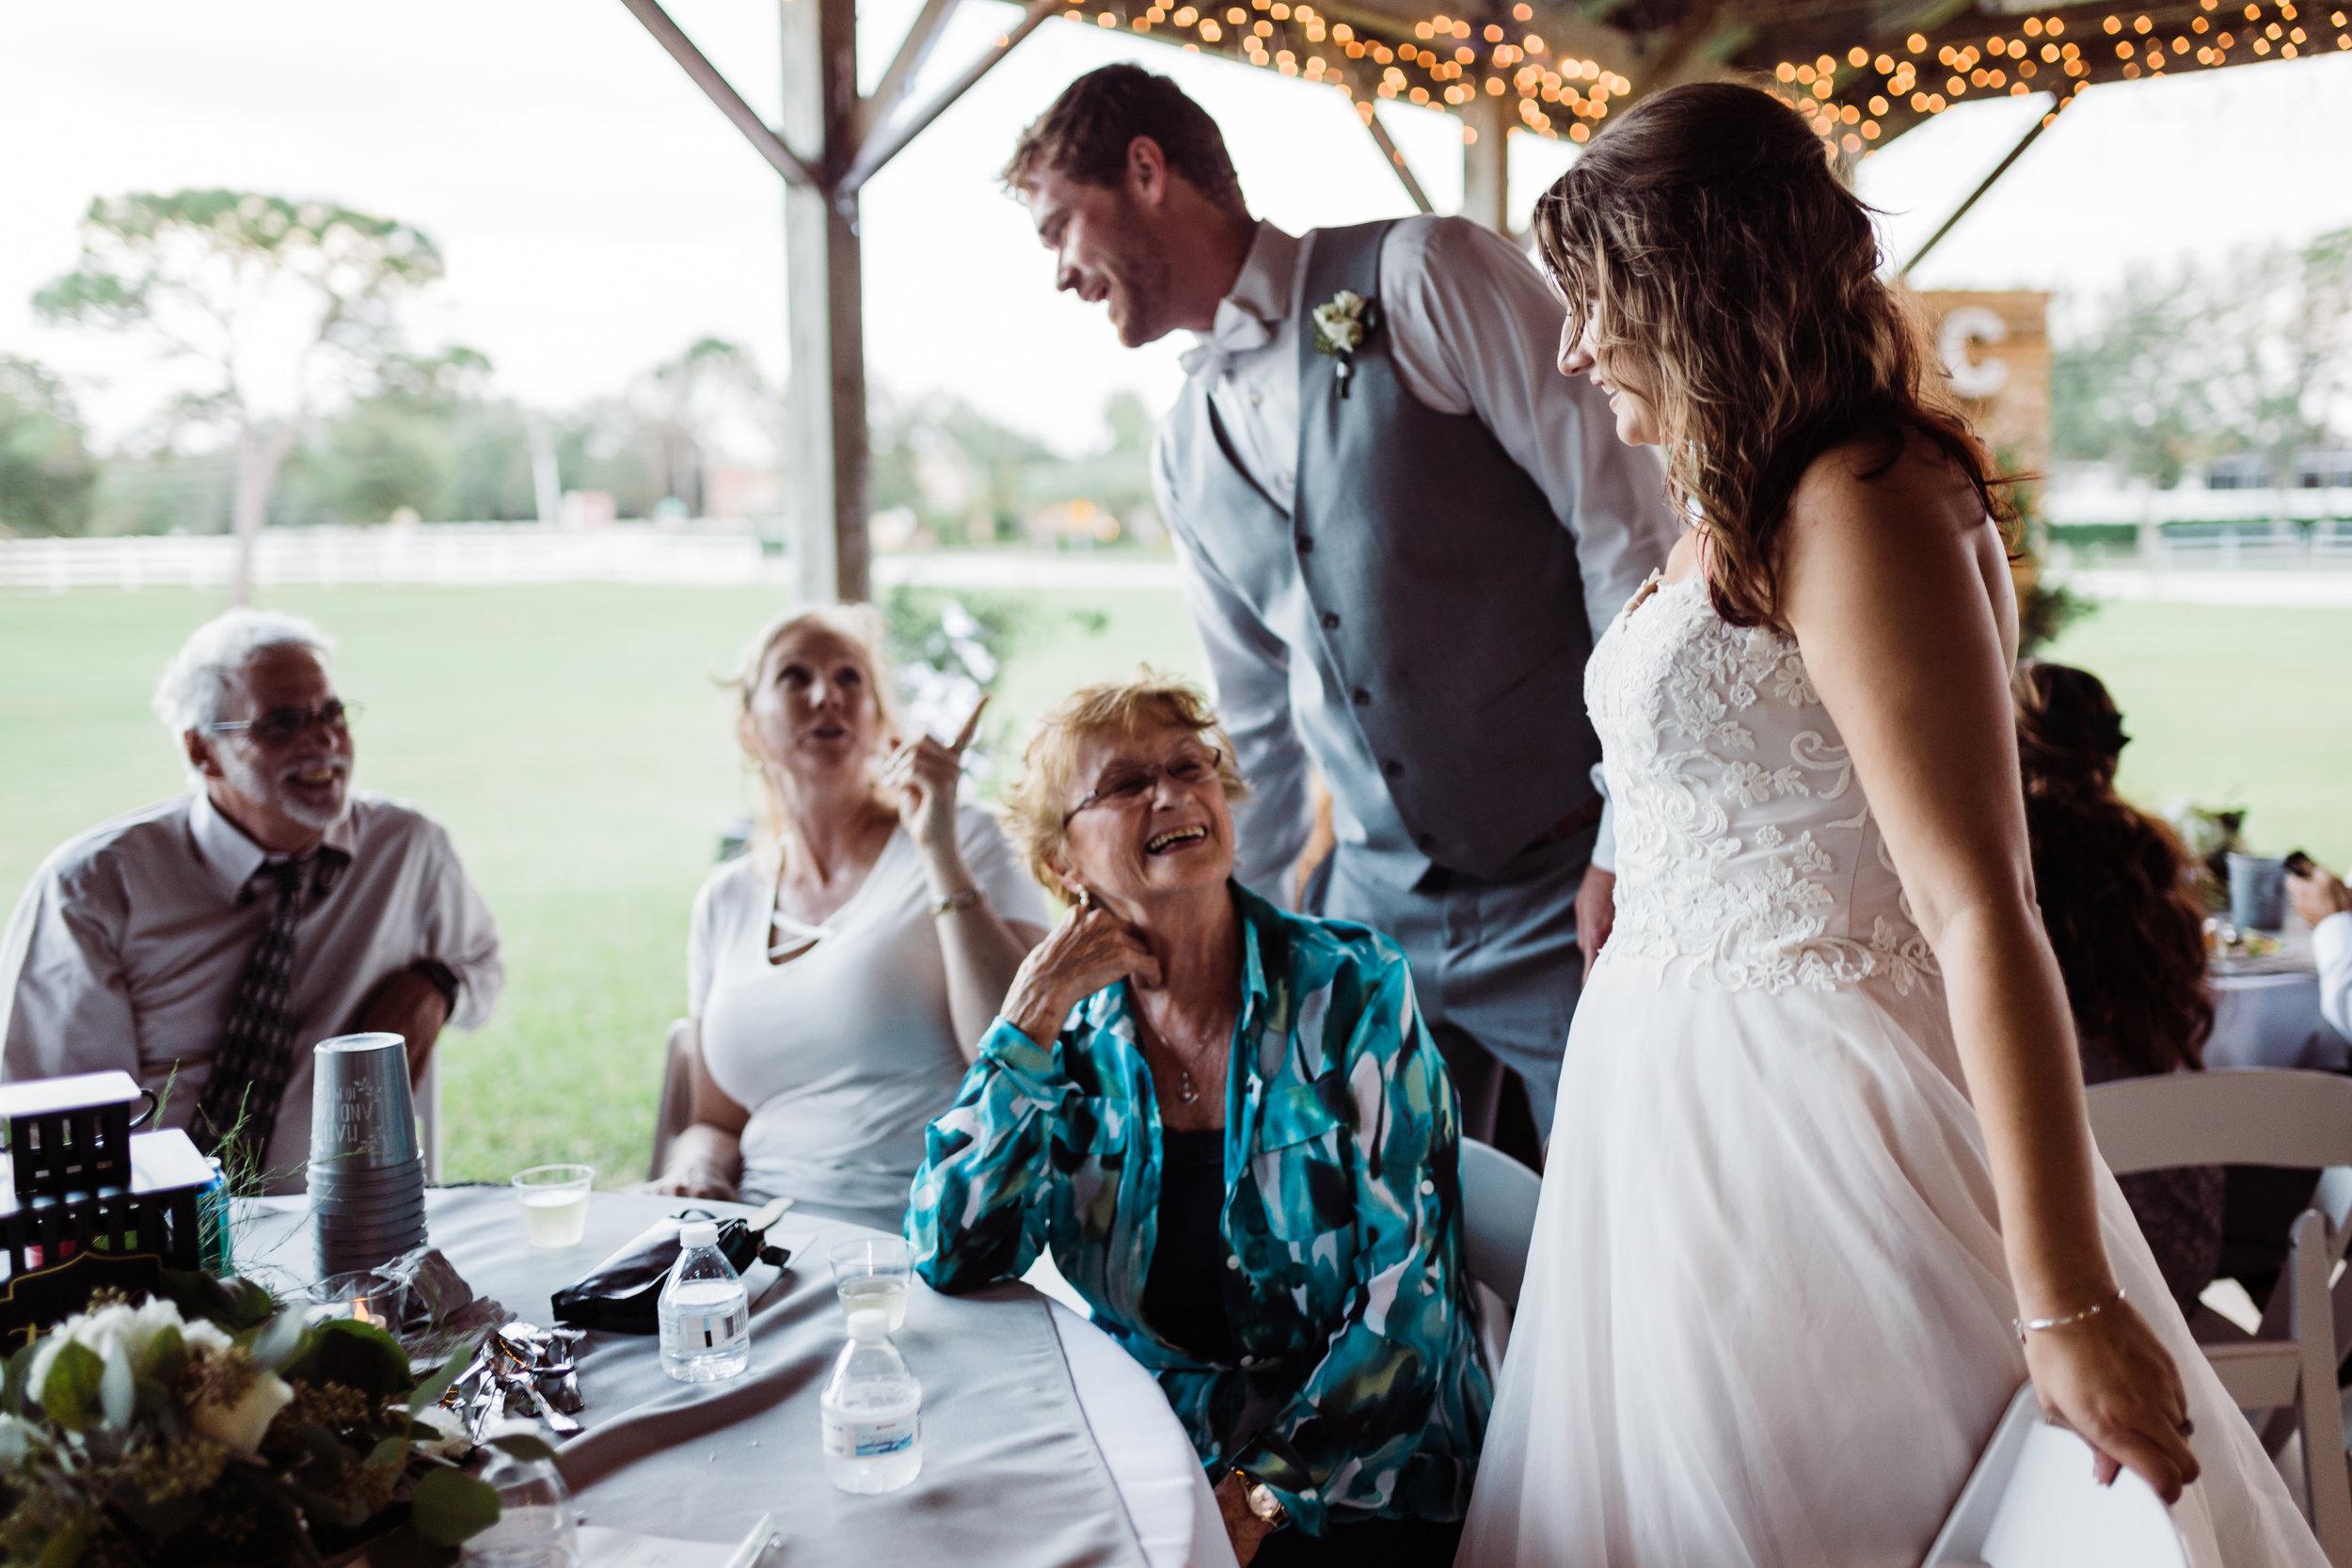 2017.10.14 Samantha and Matthew Crabtree Sarasota Wedding (515 of 708).jpg